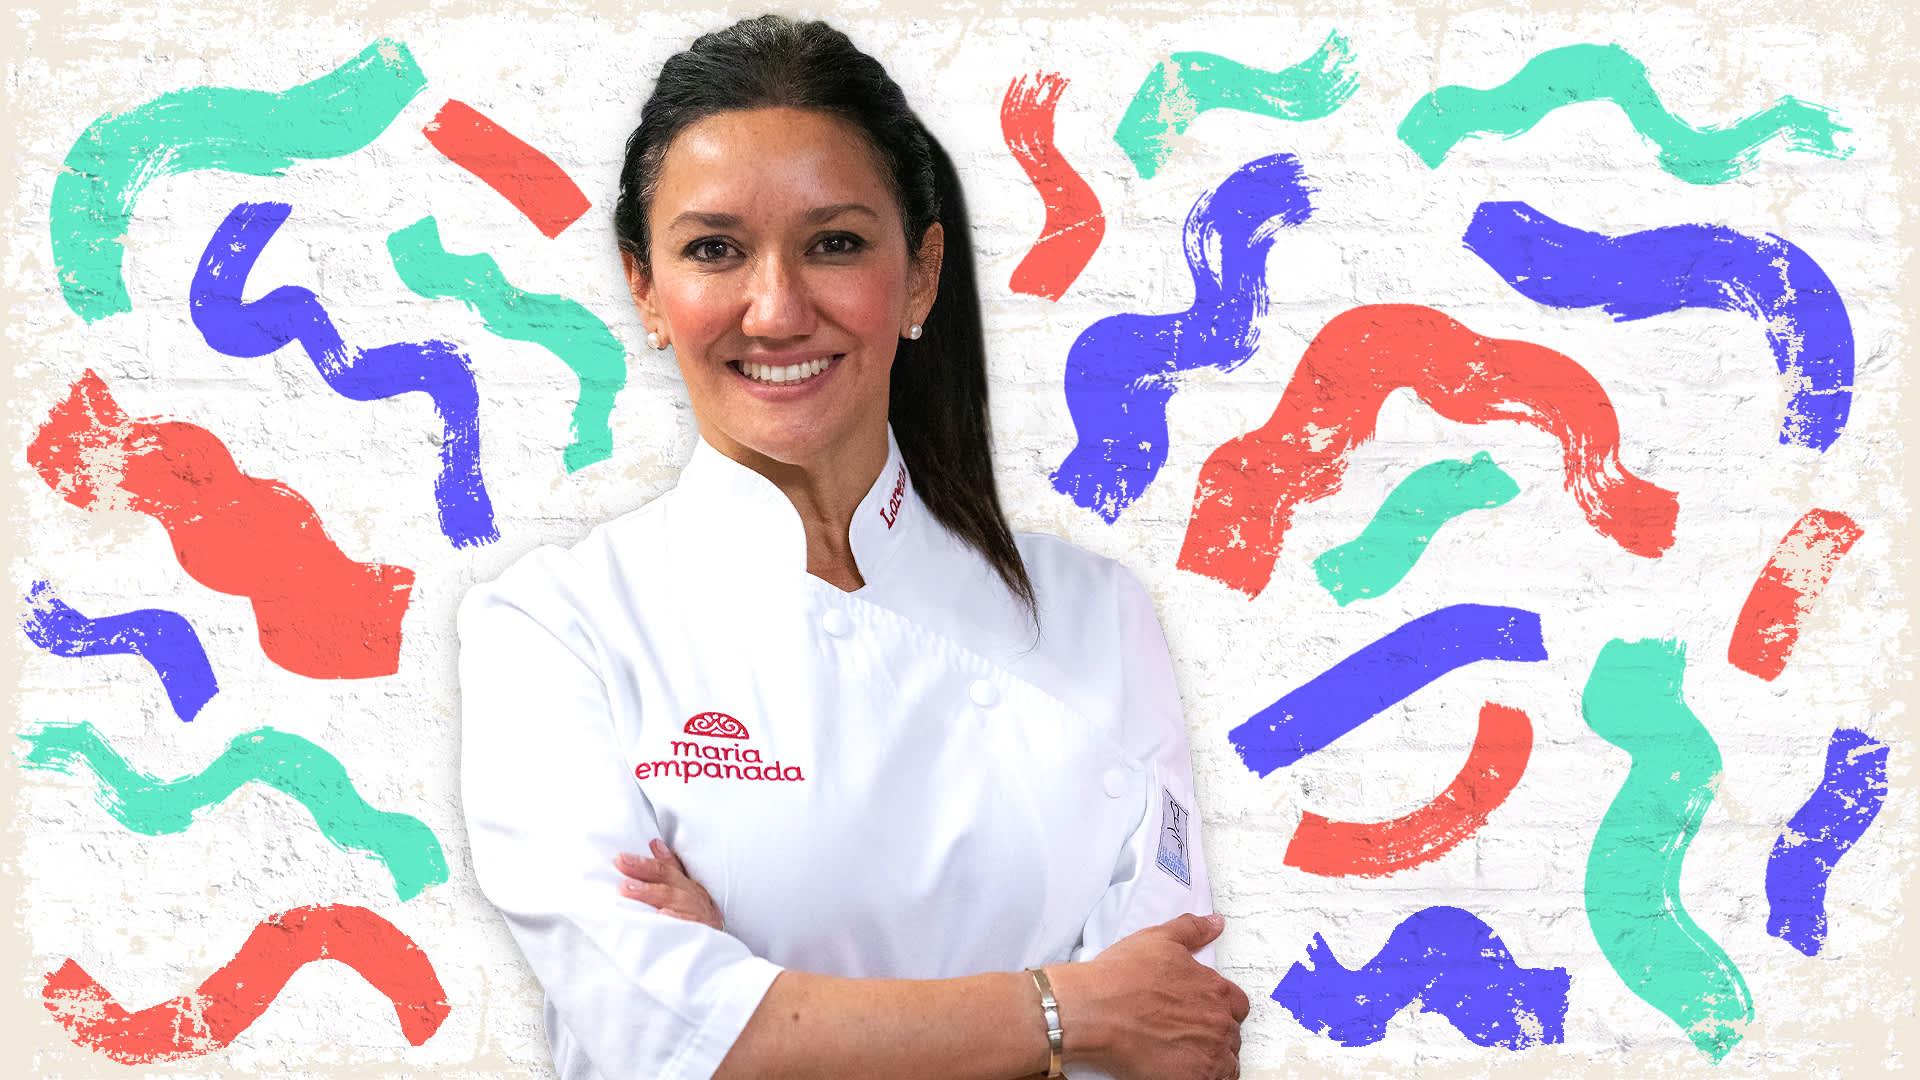 Lorena Cantarovici, Founder and CEO, Maria Empanada